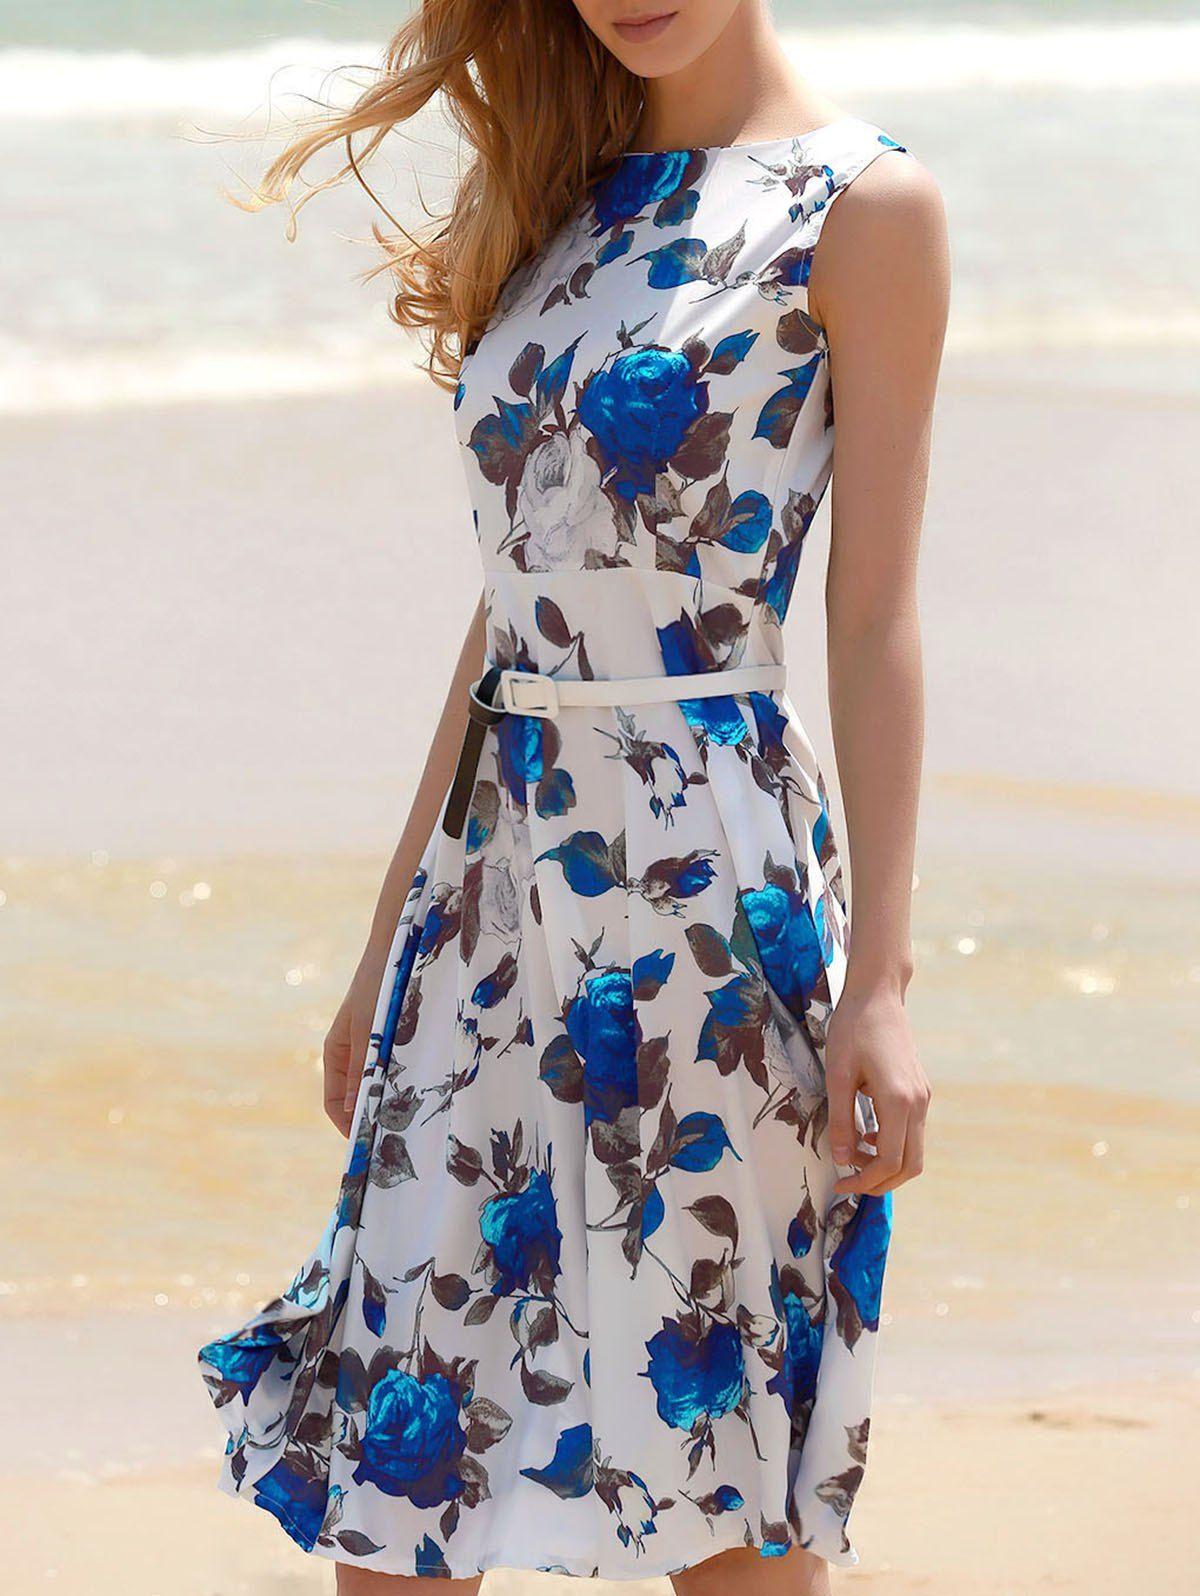 Printed Sleeveless Floral Belted Dress | Blue floral dresses ...